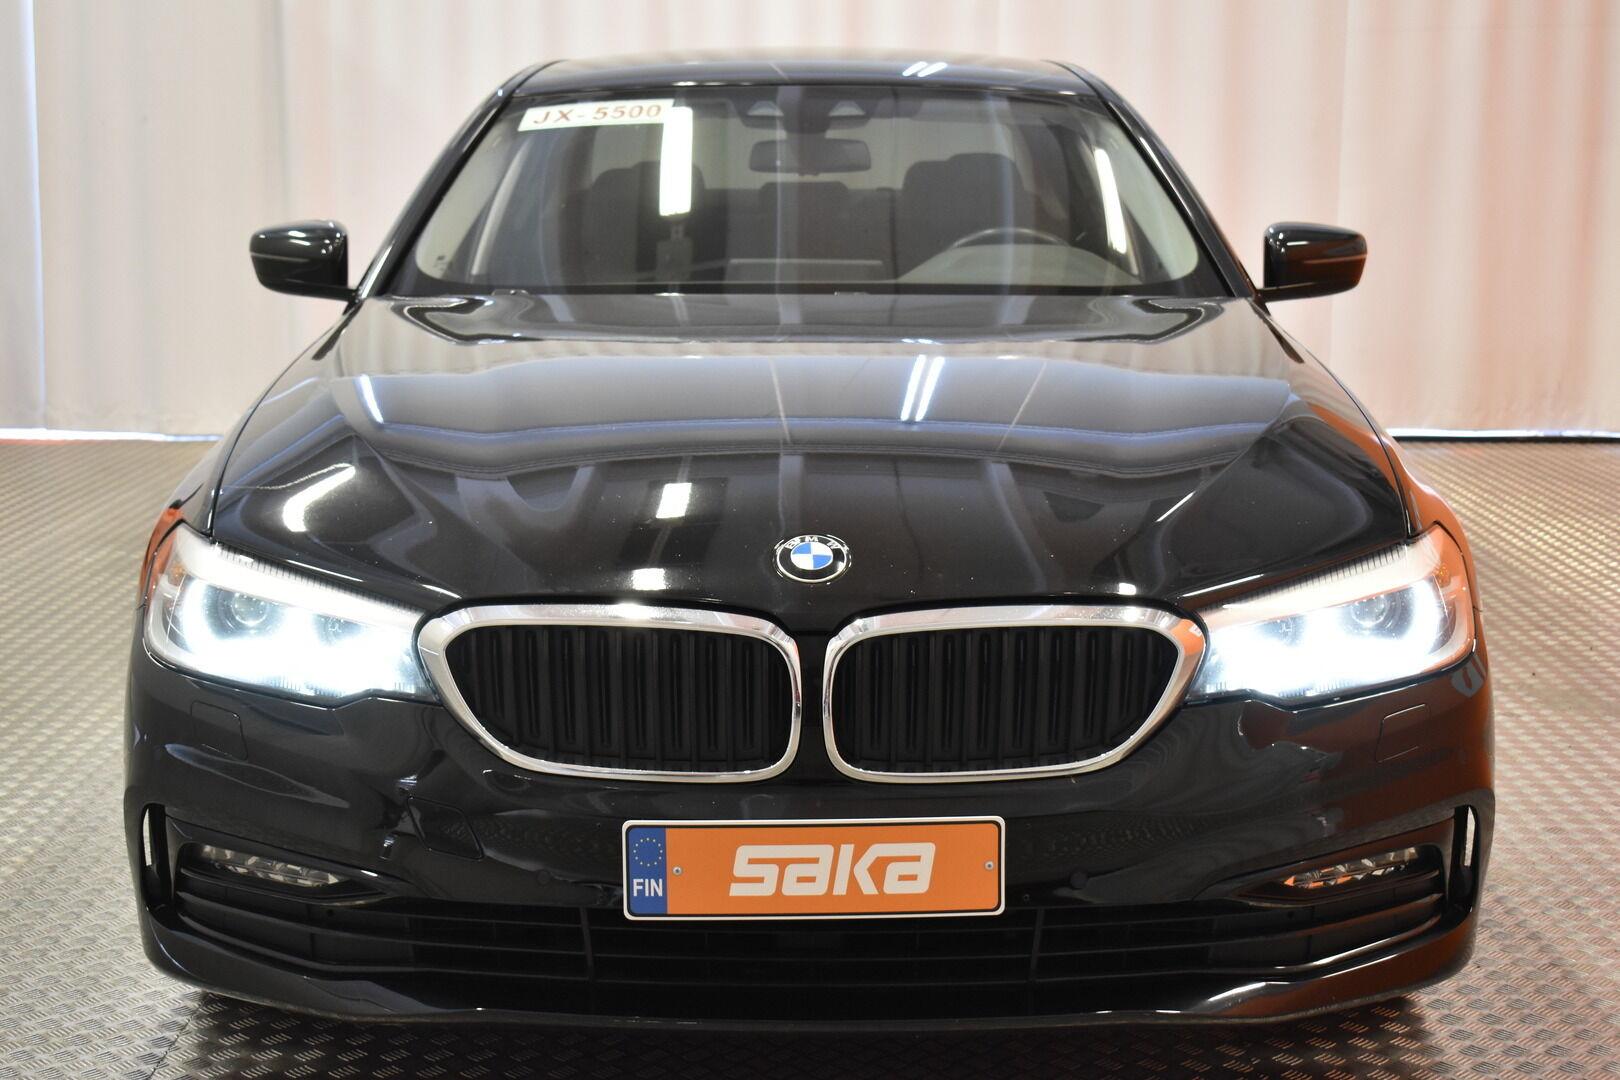 Musta Sedan, BMW 520 – EXP-5828, kuva 1